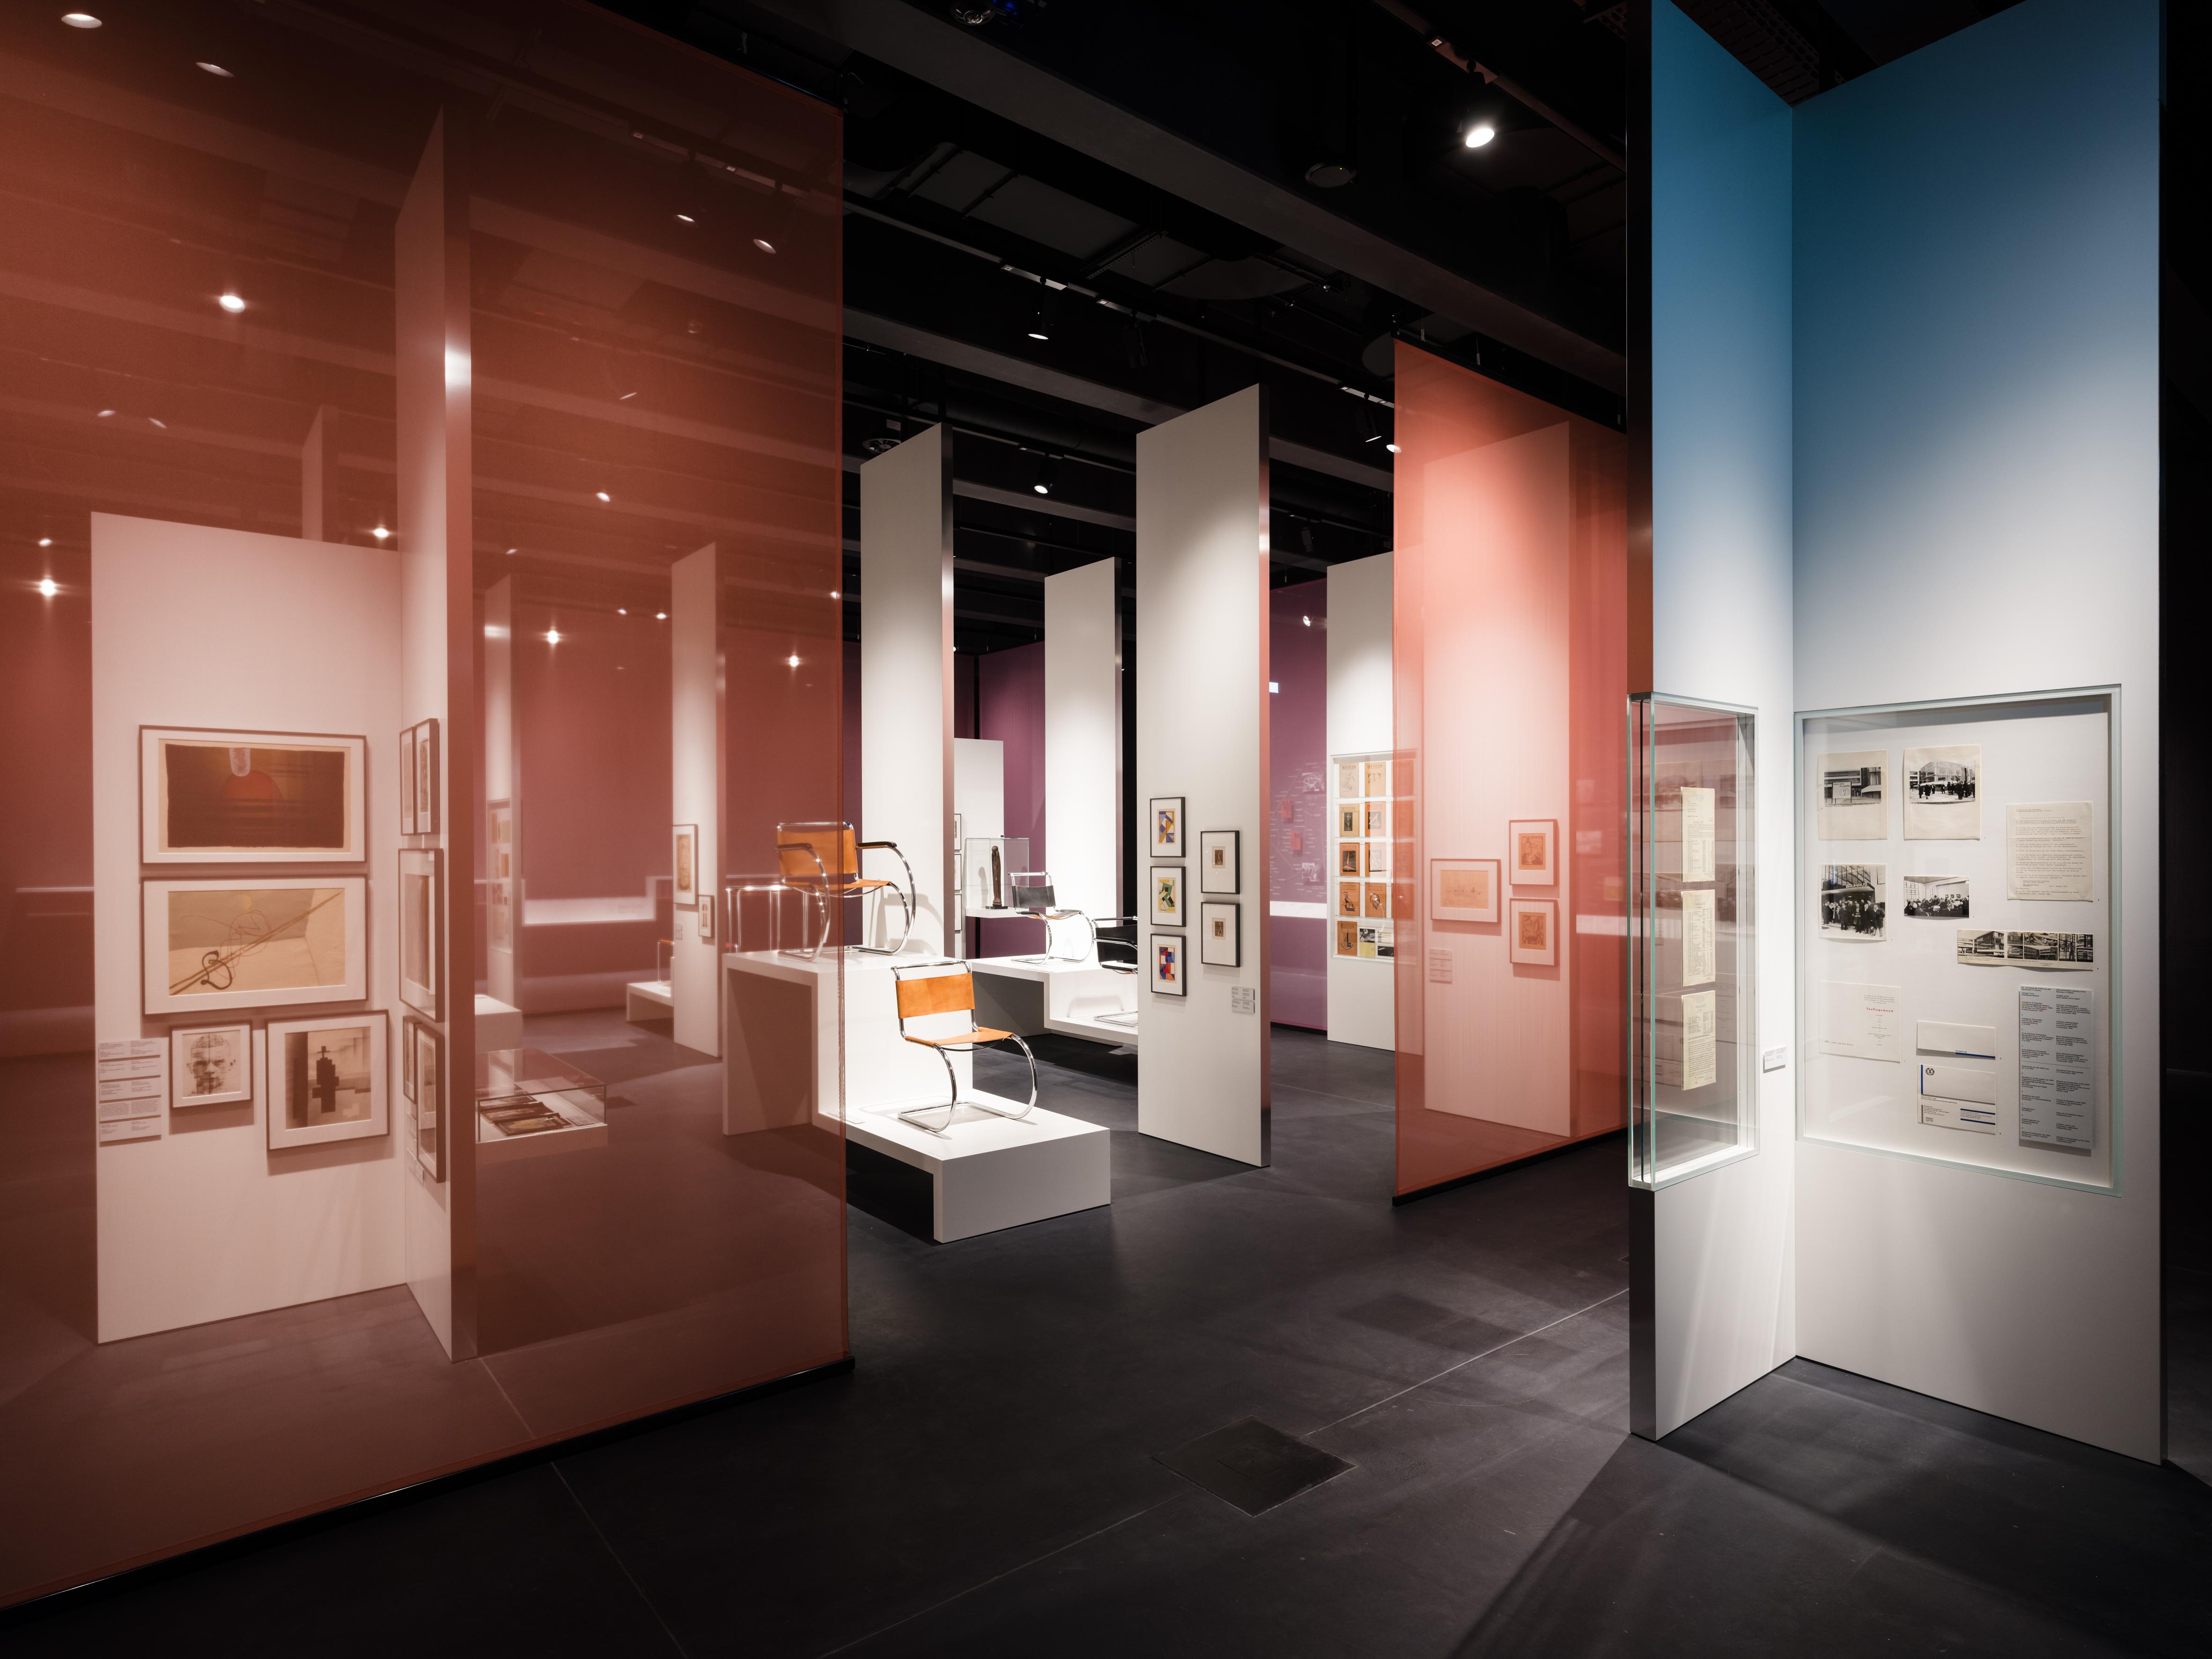 Versuchsstätte Bauhaus. The Collection (courtesy of BMD Foundation)